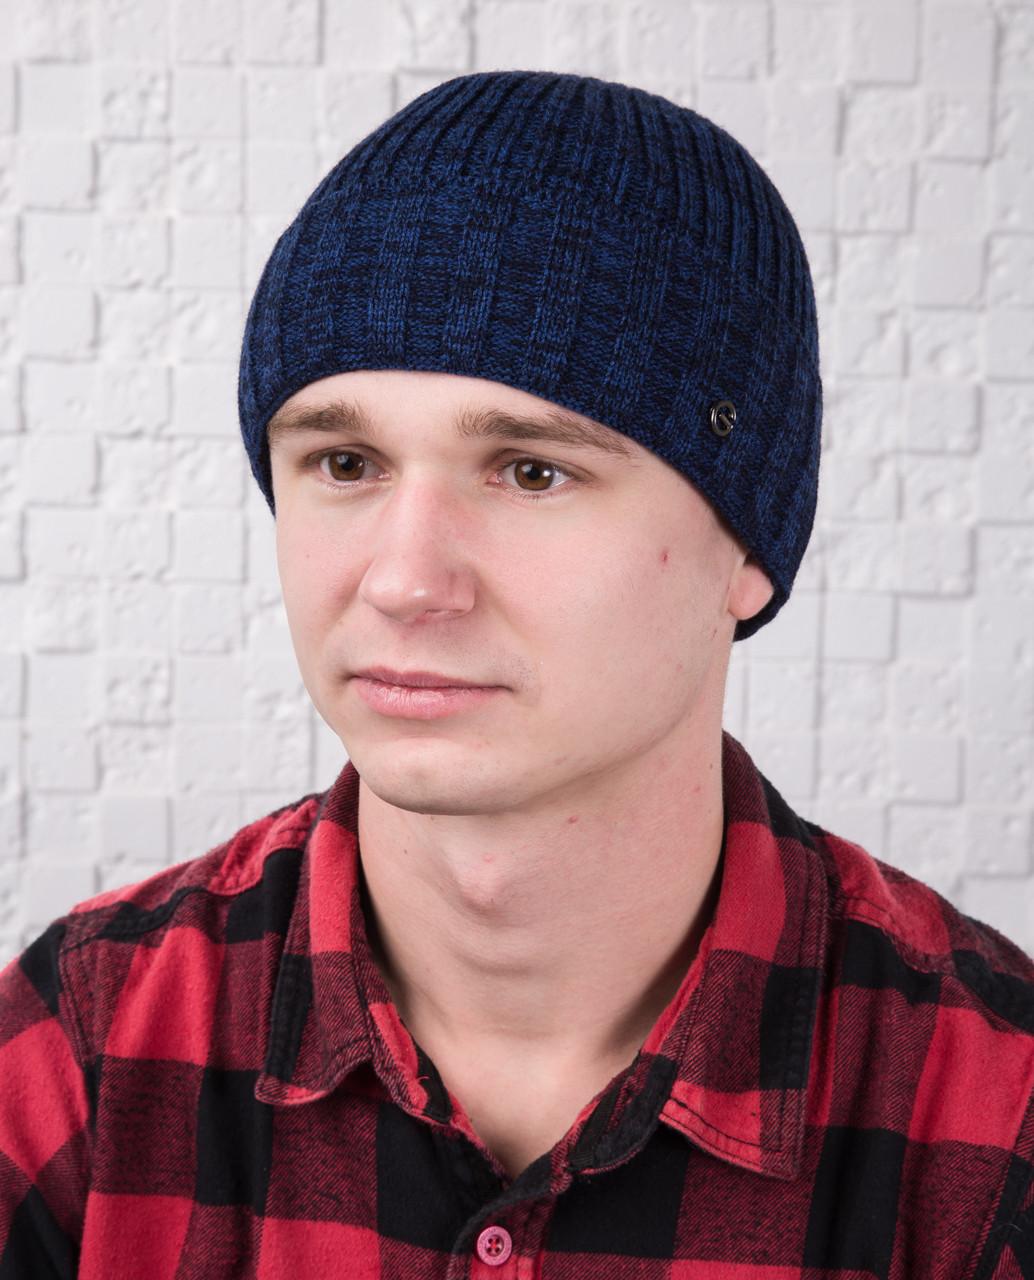 Зимняя вязаная мужская шапка с отворотом - Артикул Гоша (синий меландж)